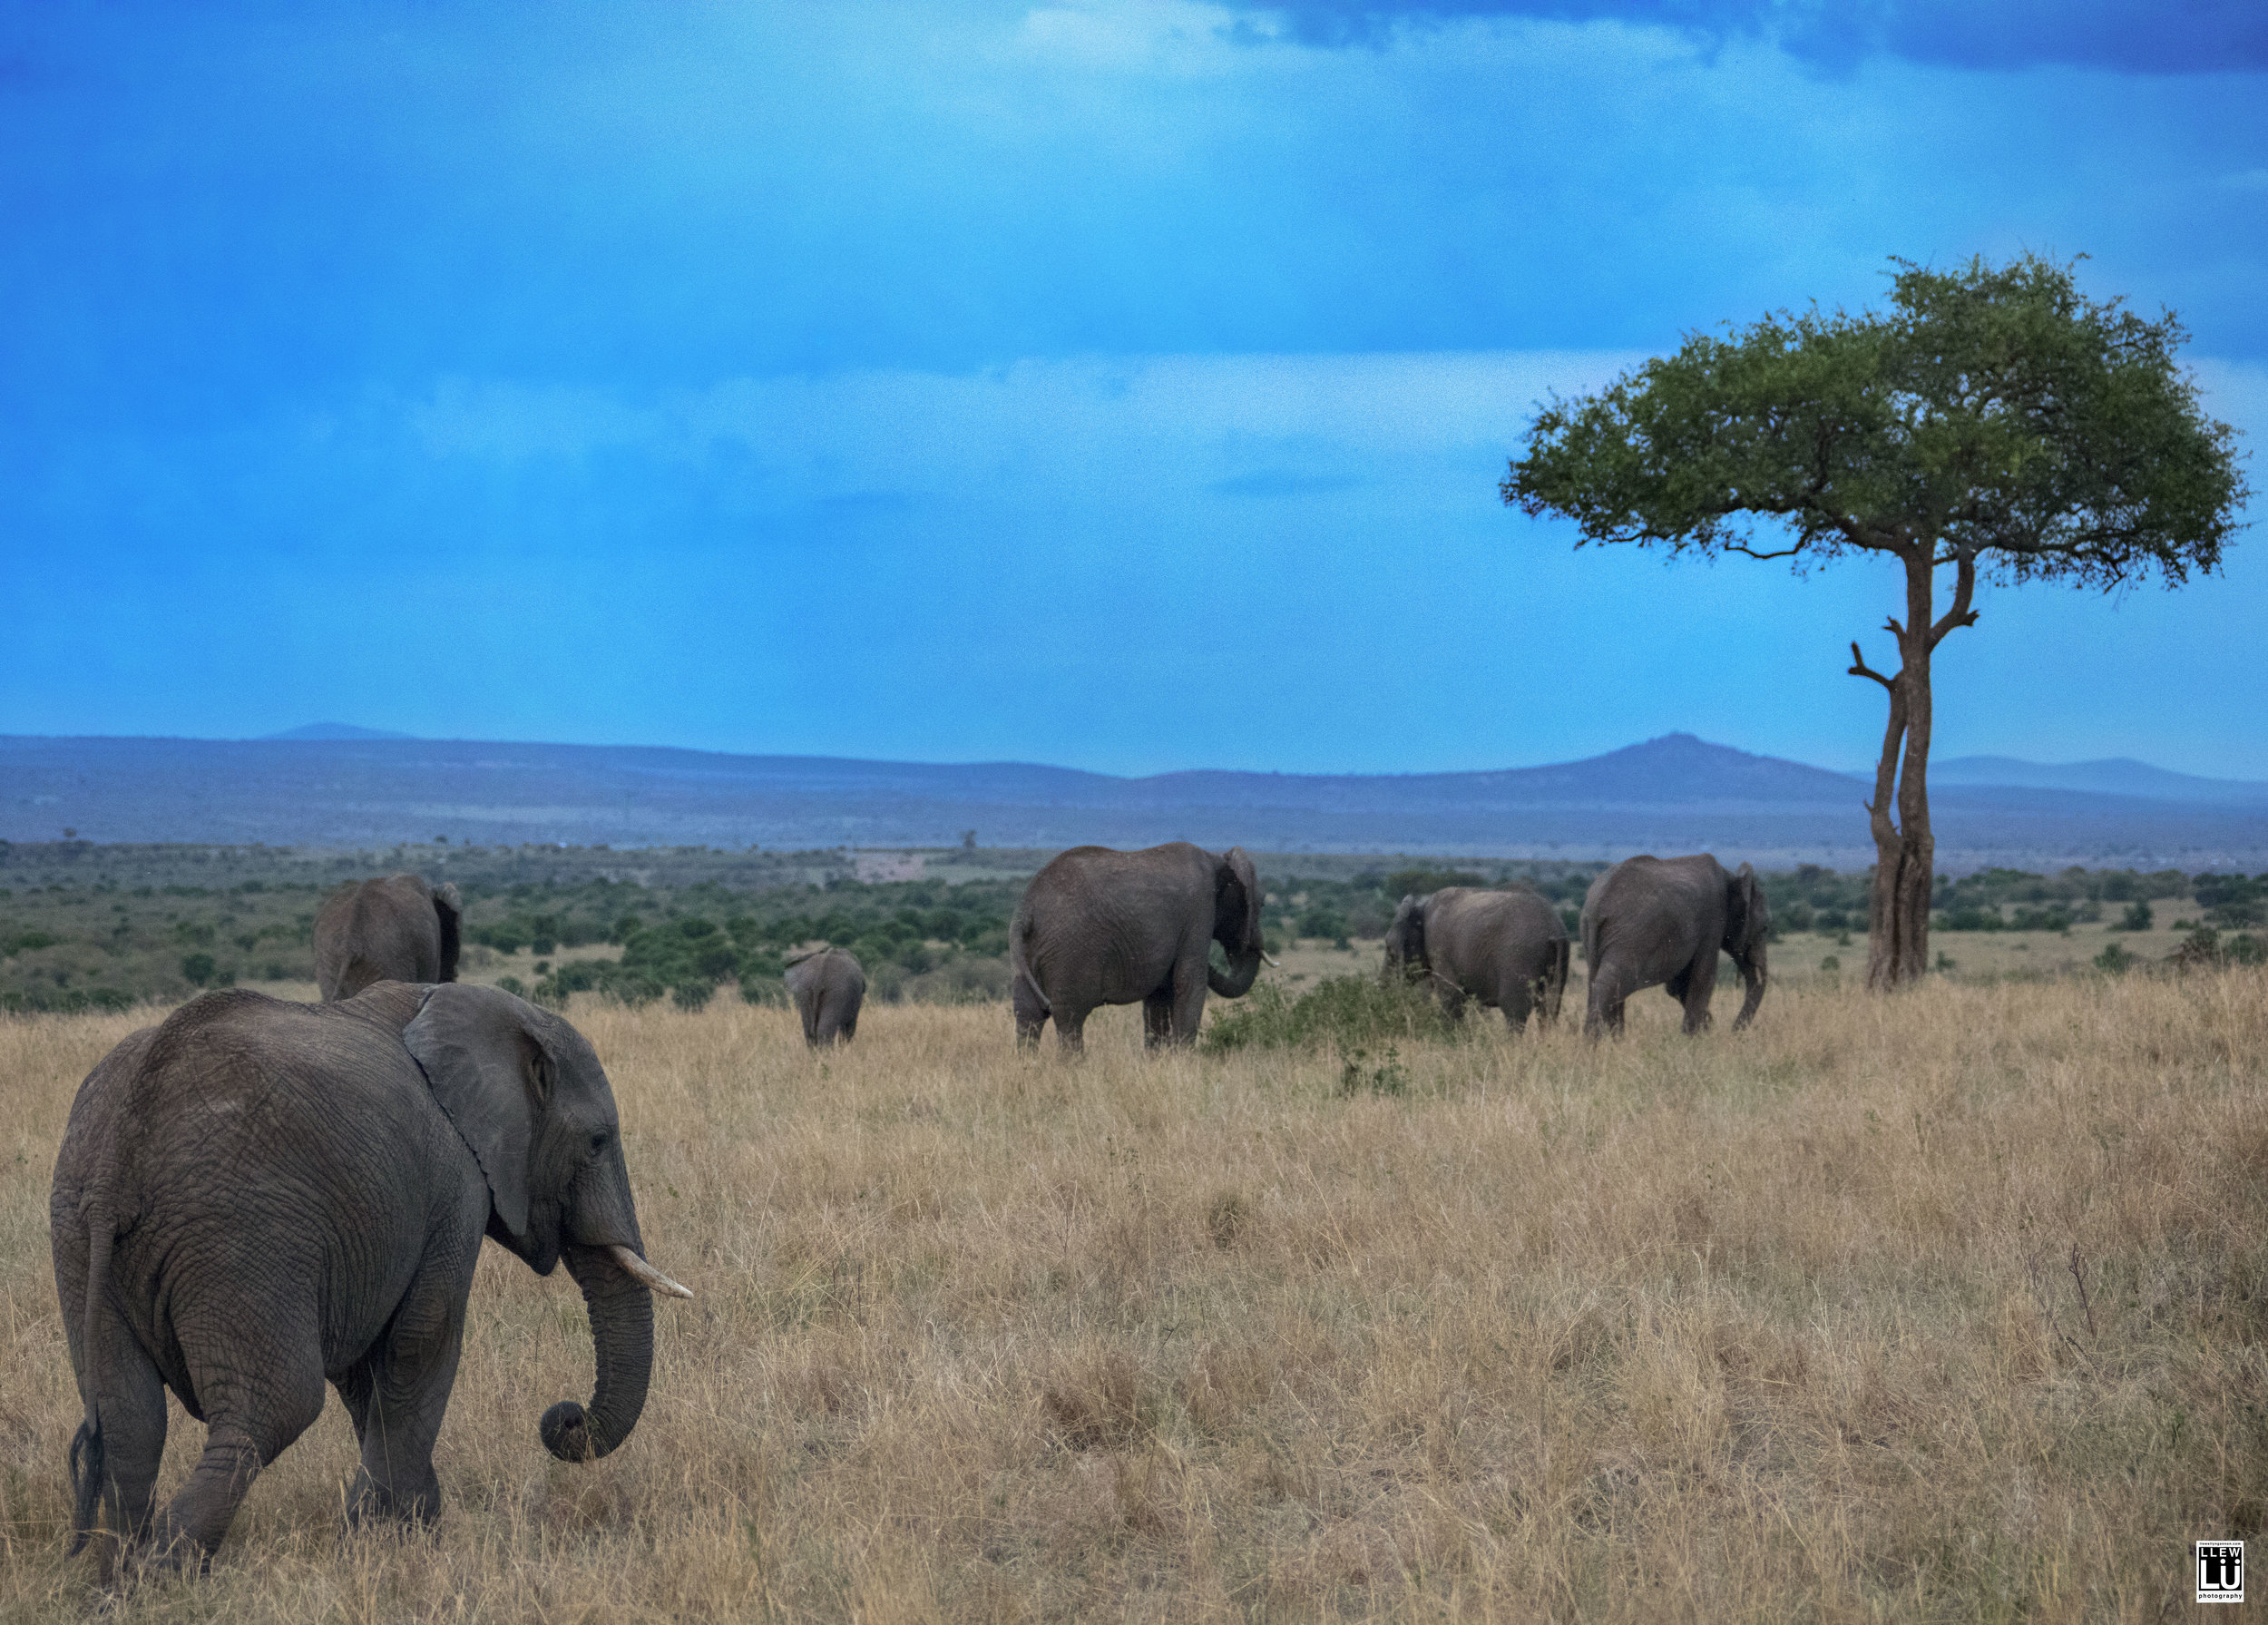 Elephants of Masai Mara.